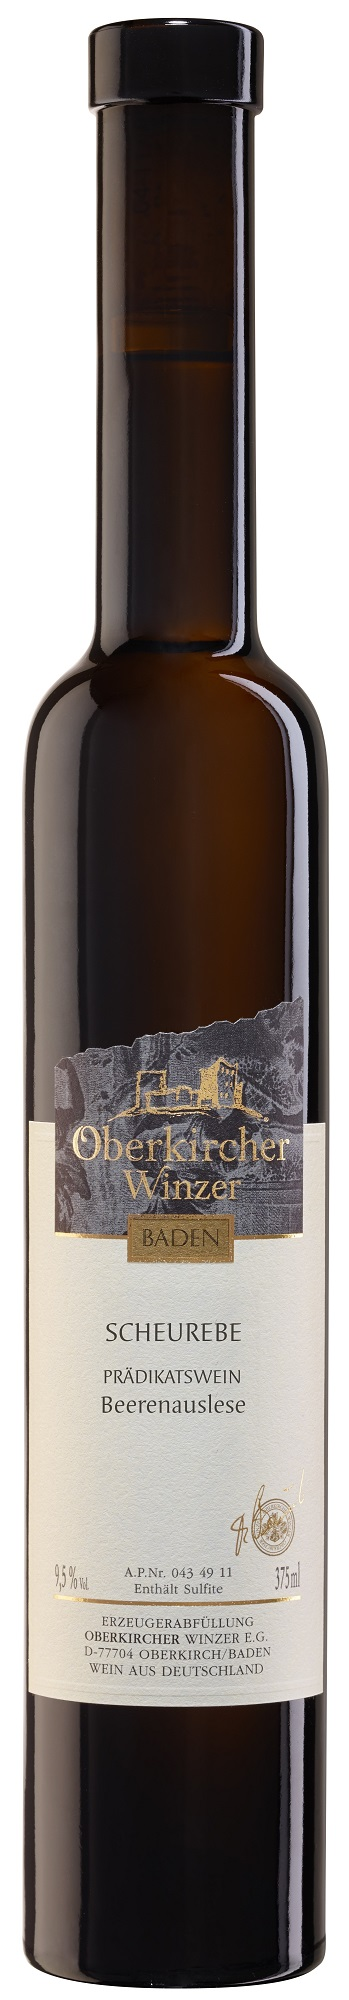 Collection Oberkirch, Scheurebe Beerenauslese